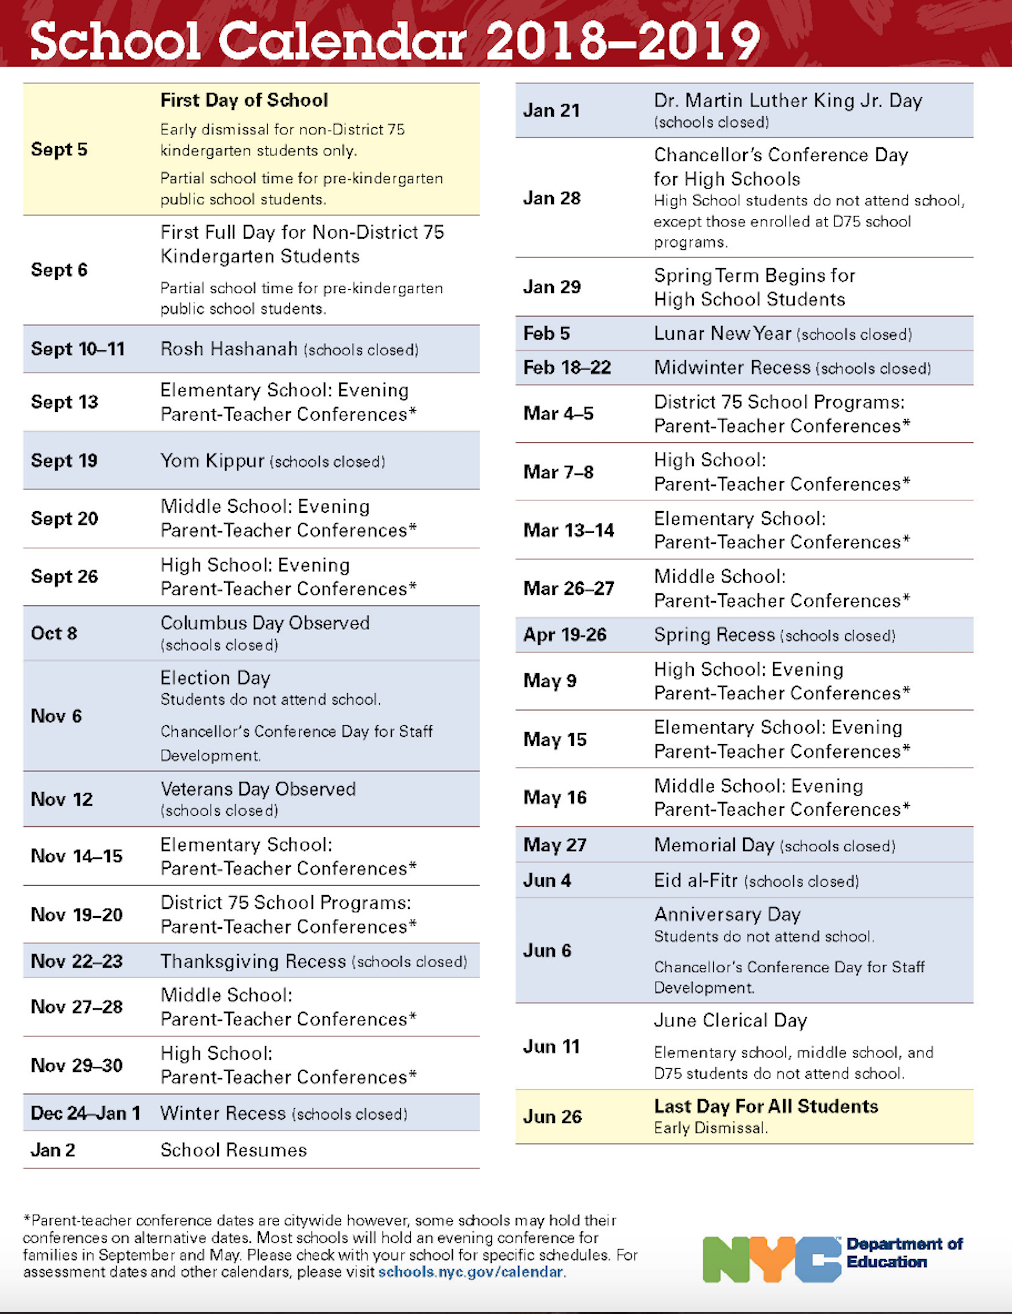 Nyc Doe 2018-2019 School Calendar | Ps 373R Robert Randall School Calendar 2019 Doe